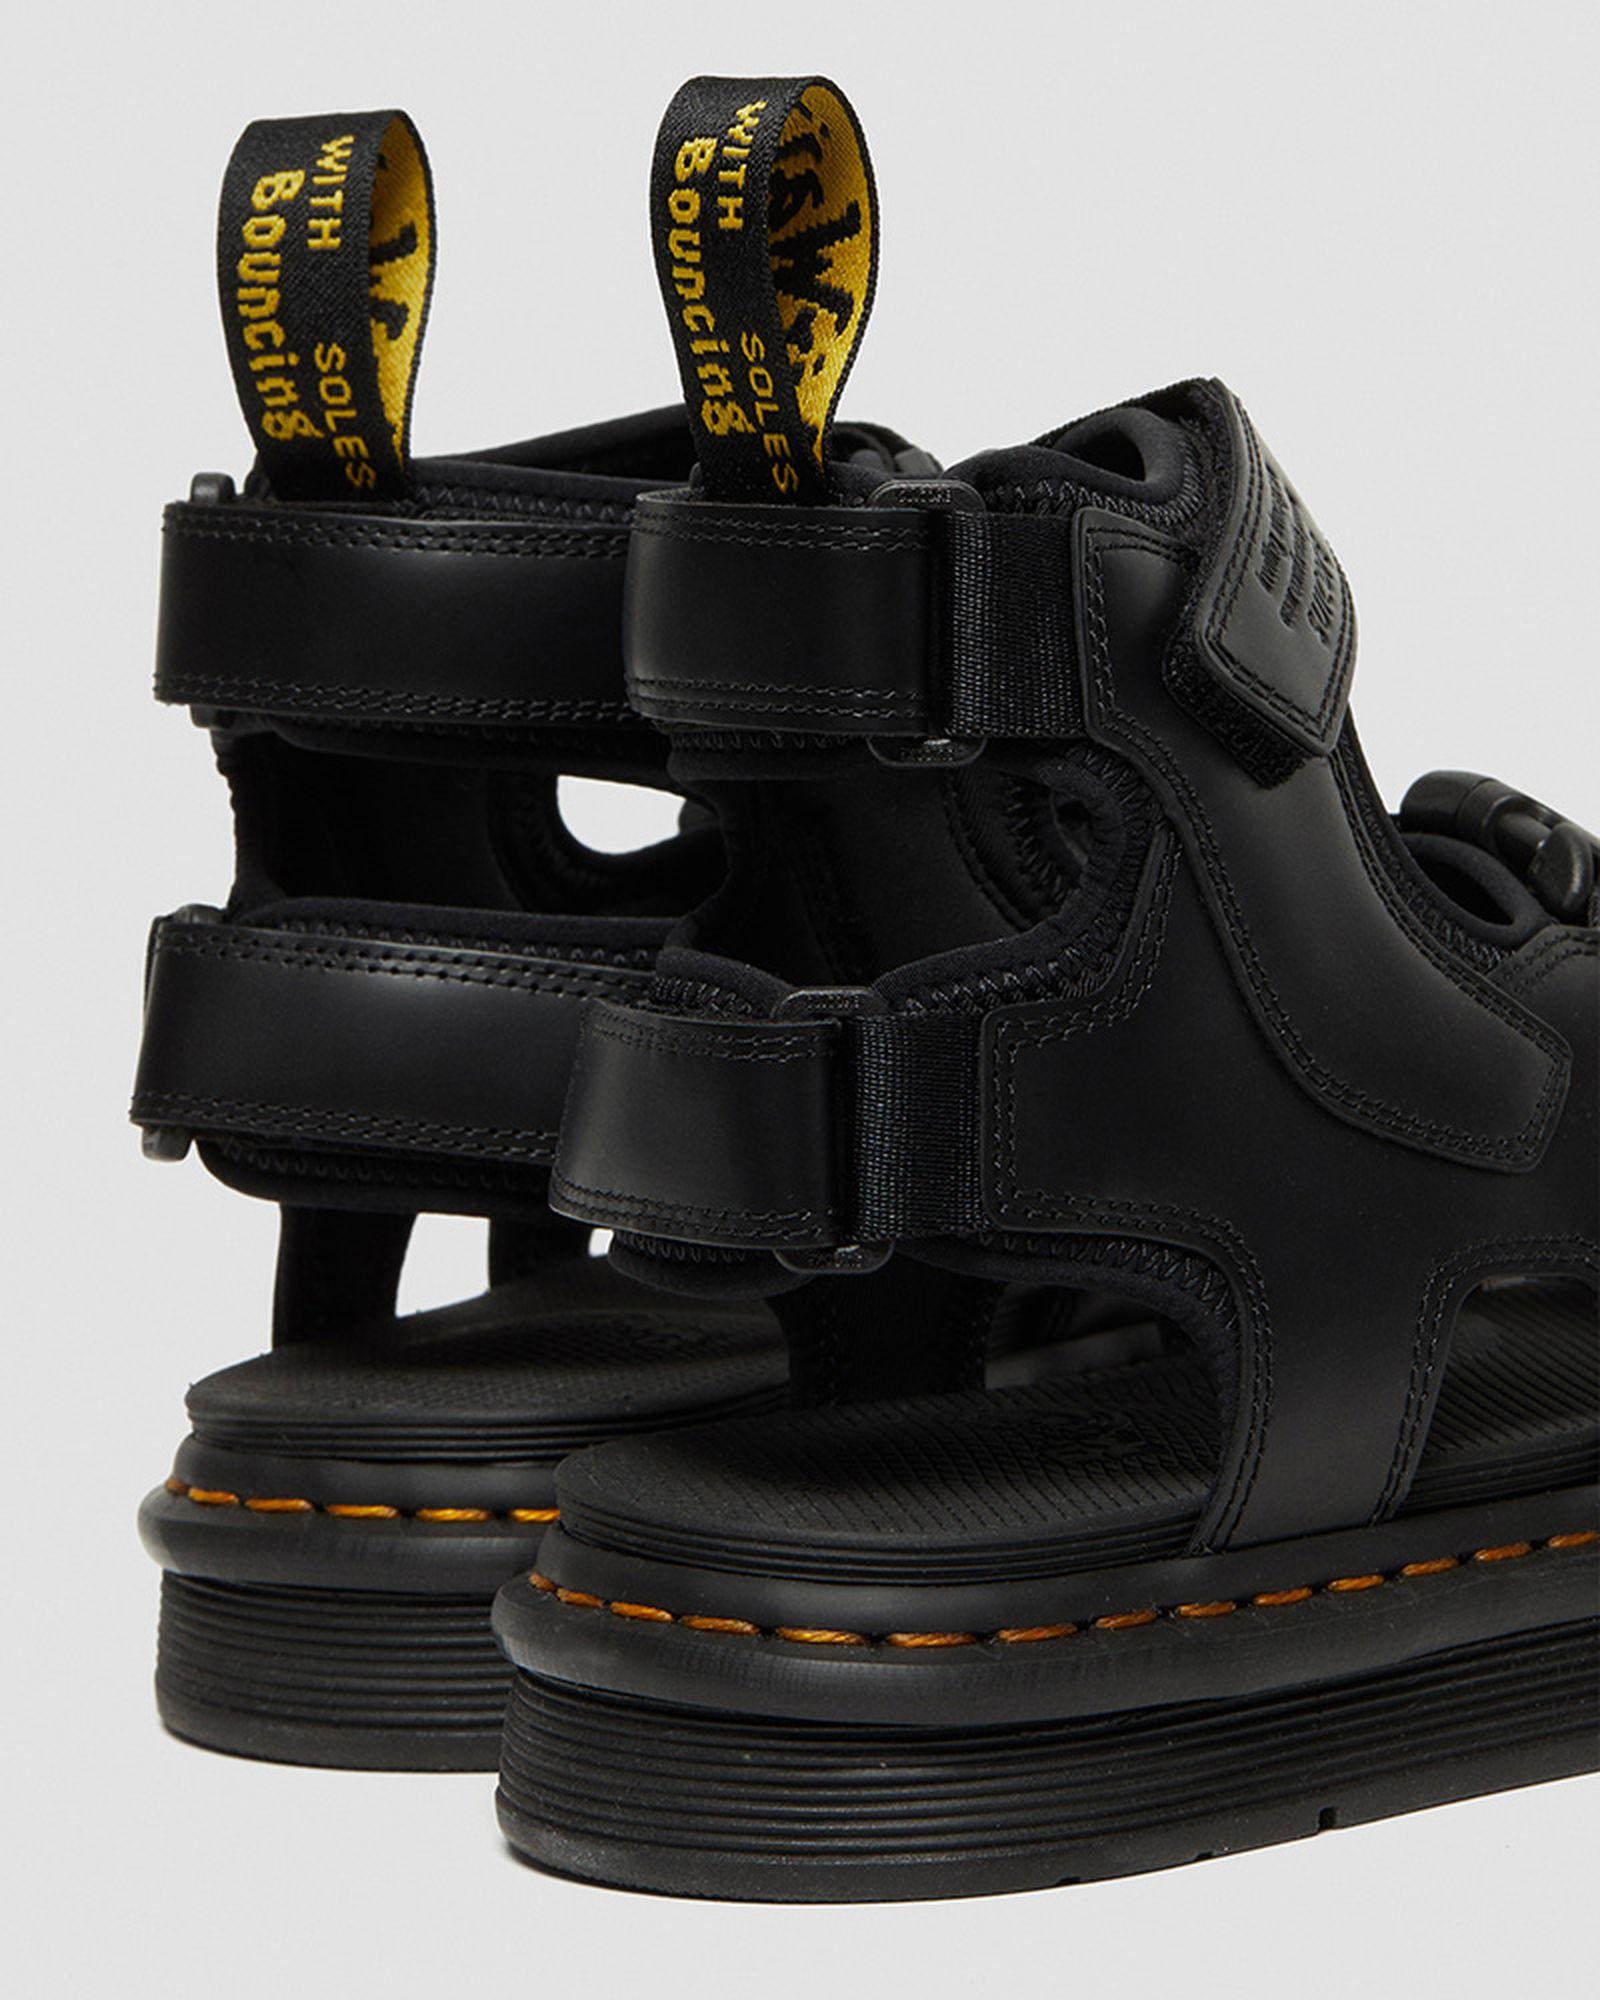 dr-martens-suicoke-sandals-release-date-price-04